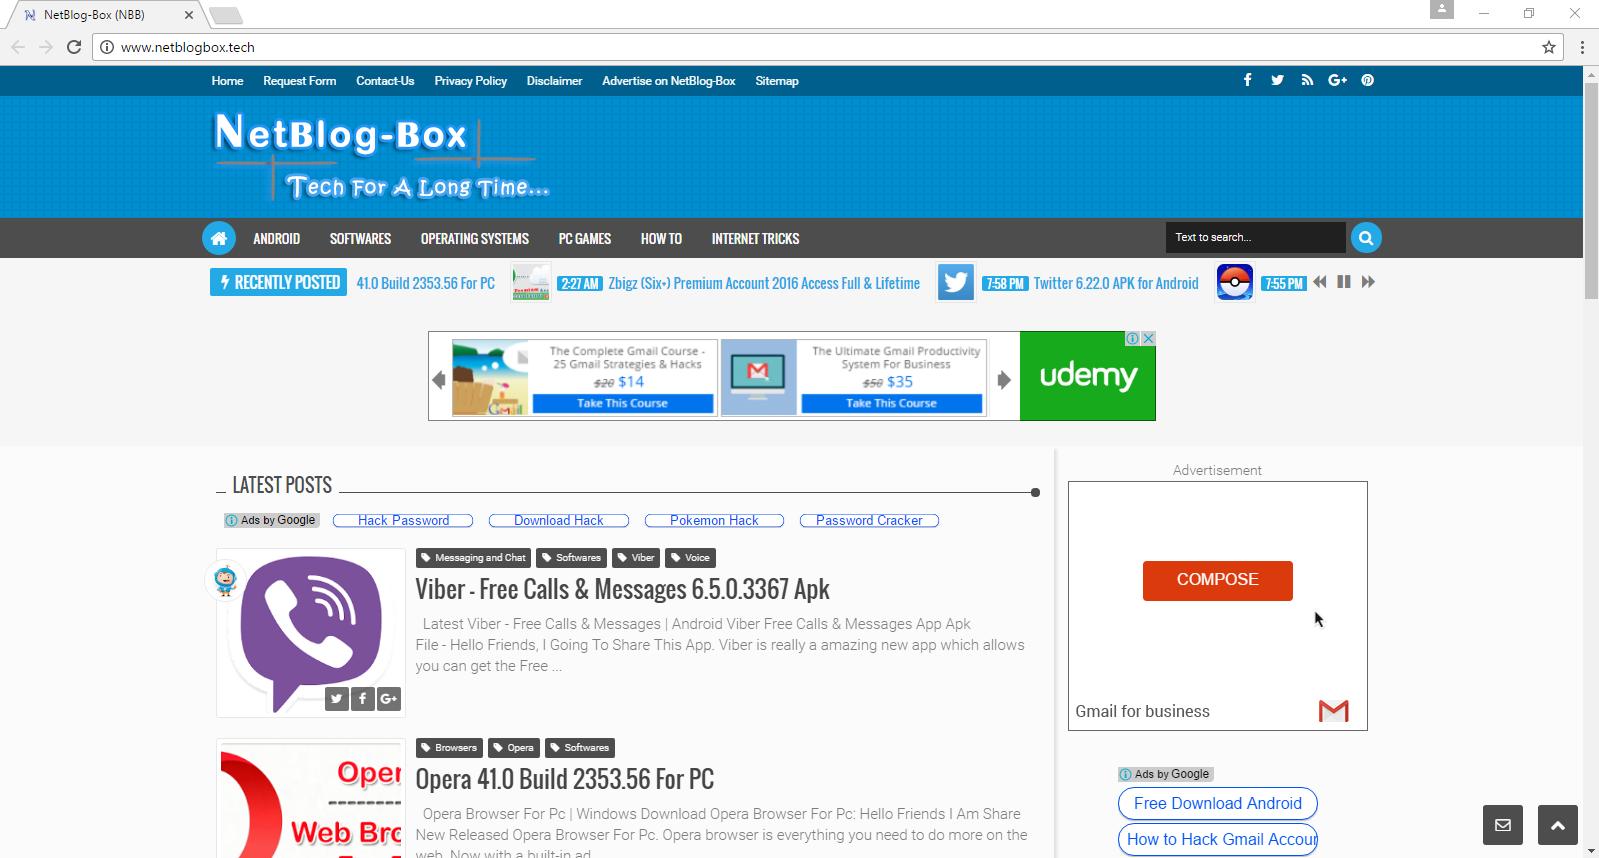 Google Chrome 58.0.3029.81 (32-bit/64-bit) Offline Installer free dowload